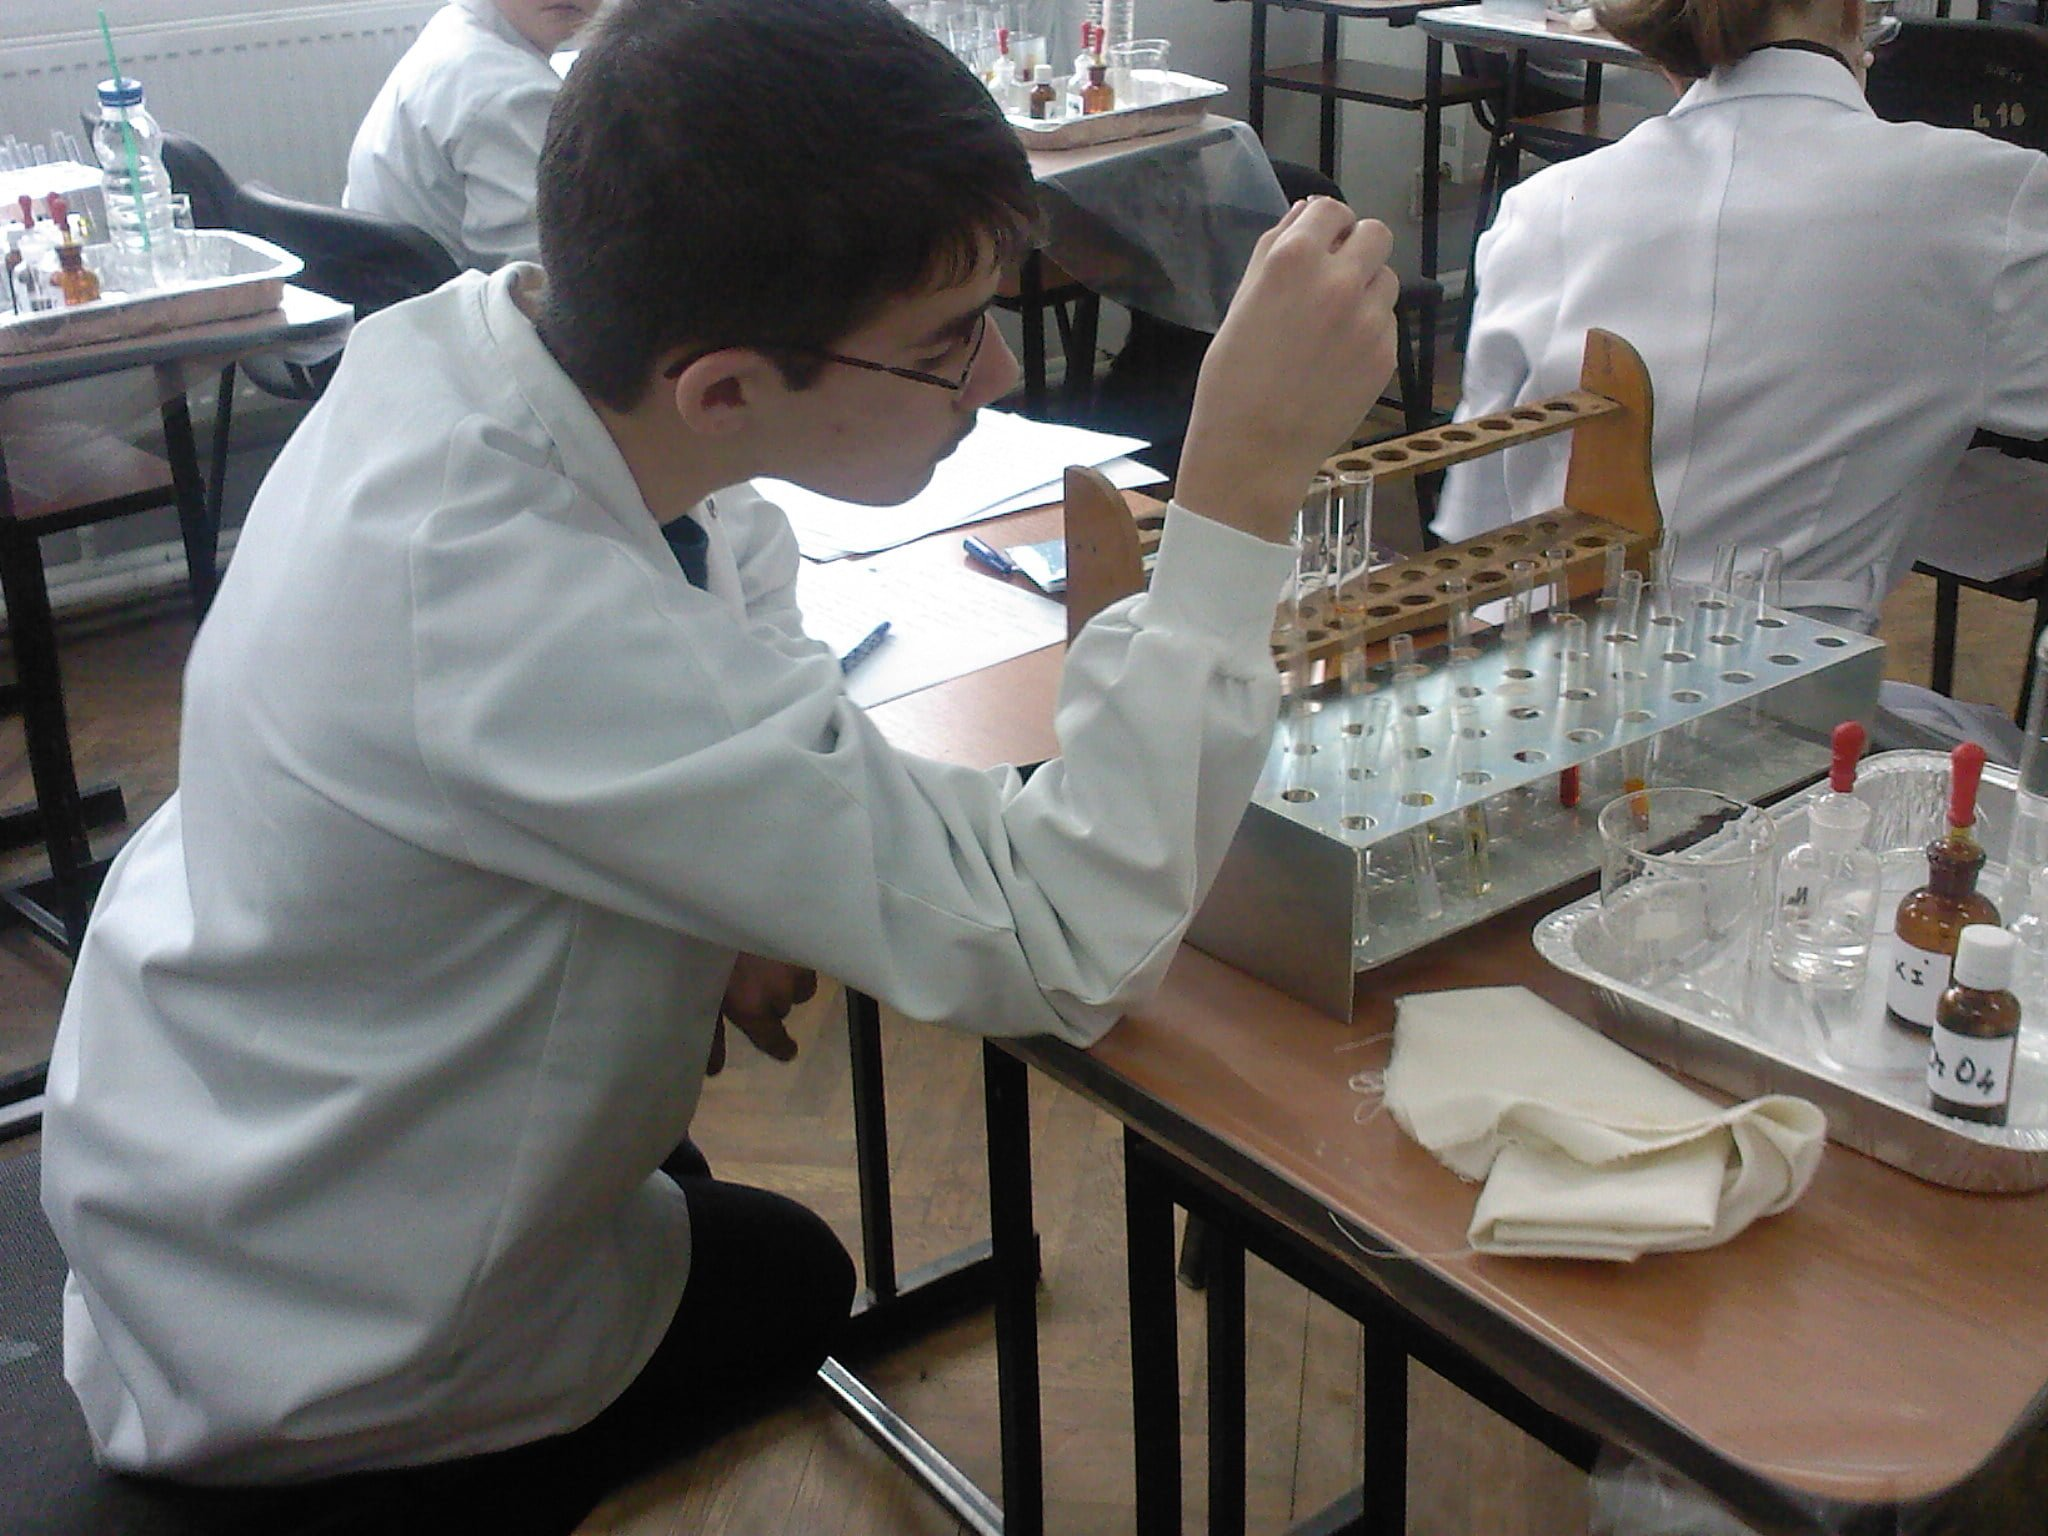 Elevii romani au obtinut trei medalii de bronz la Olimpiada Internationala de Biologie!